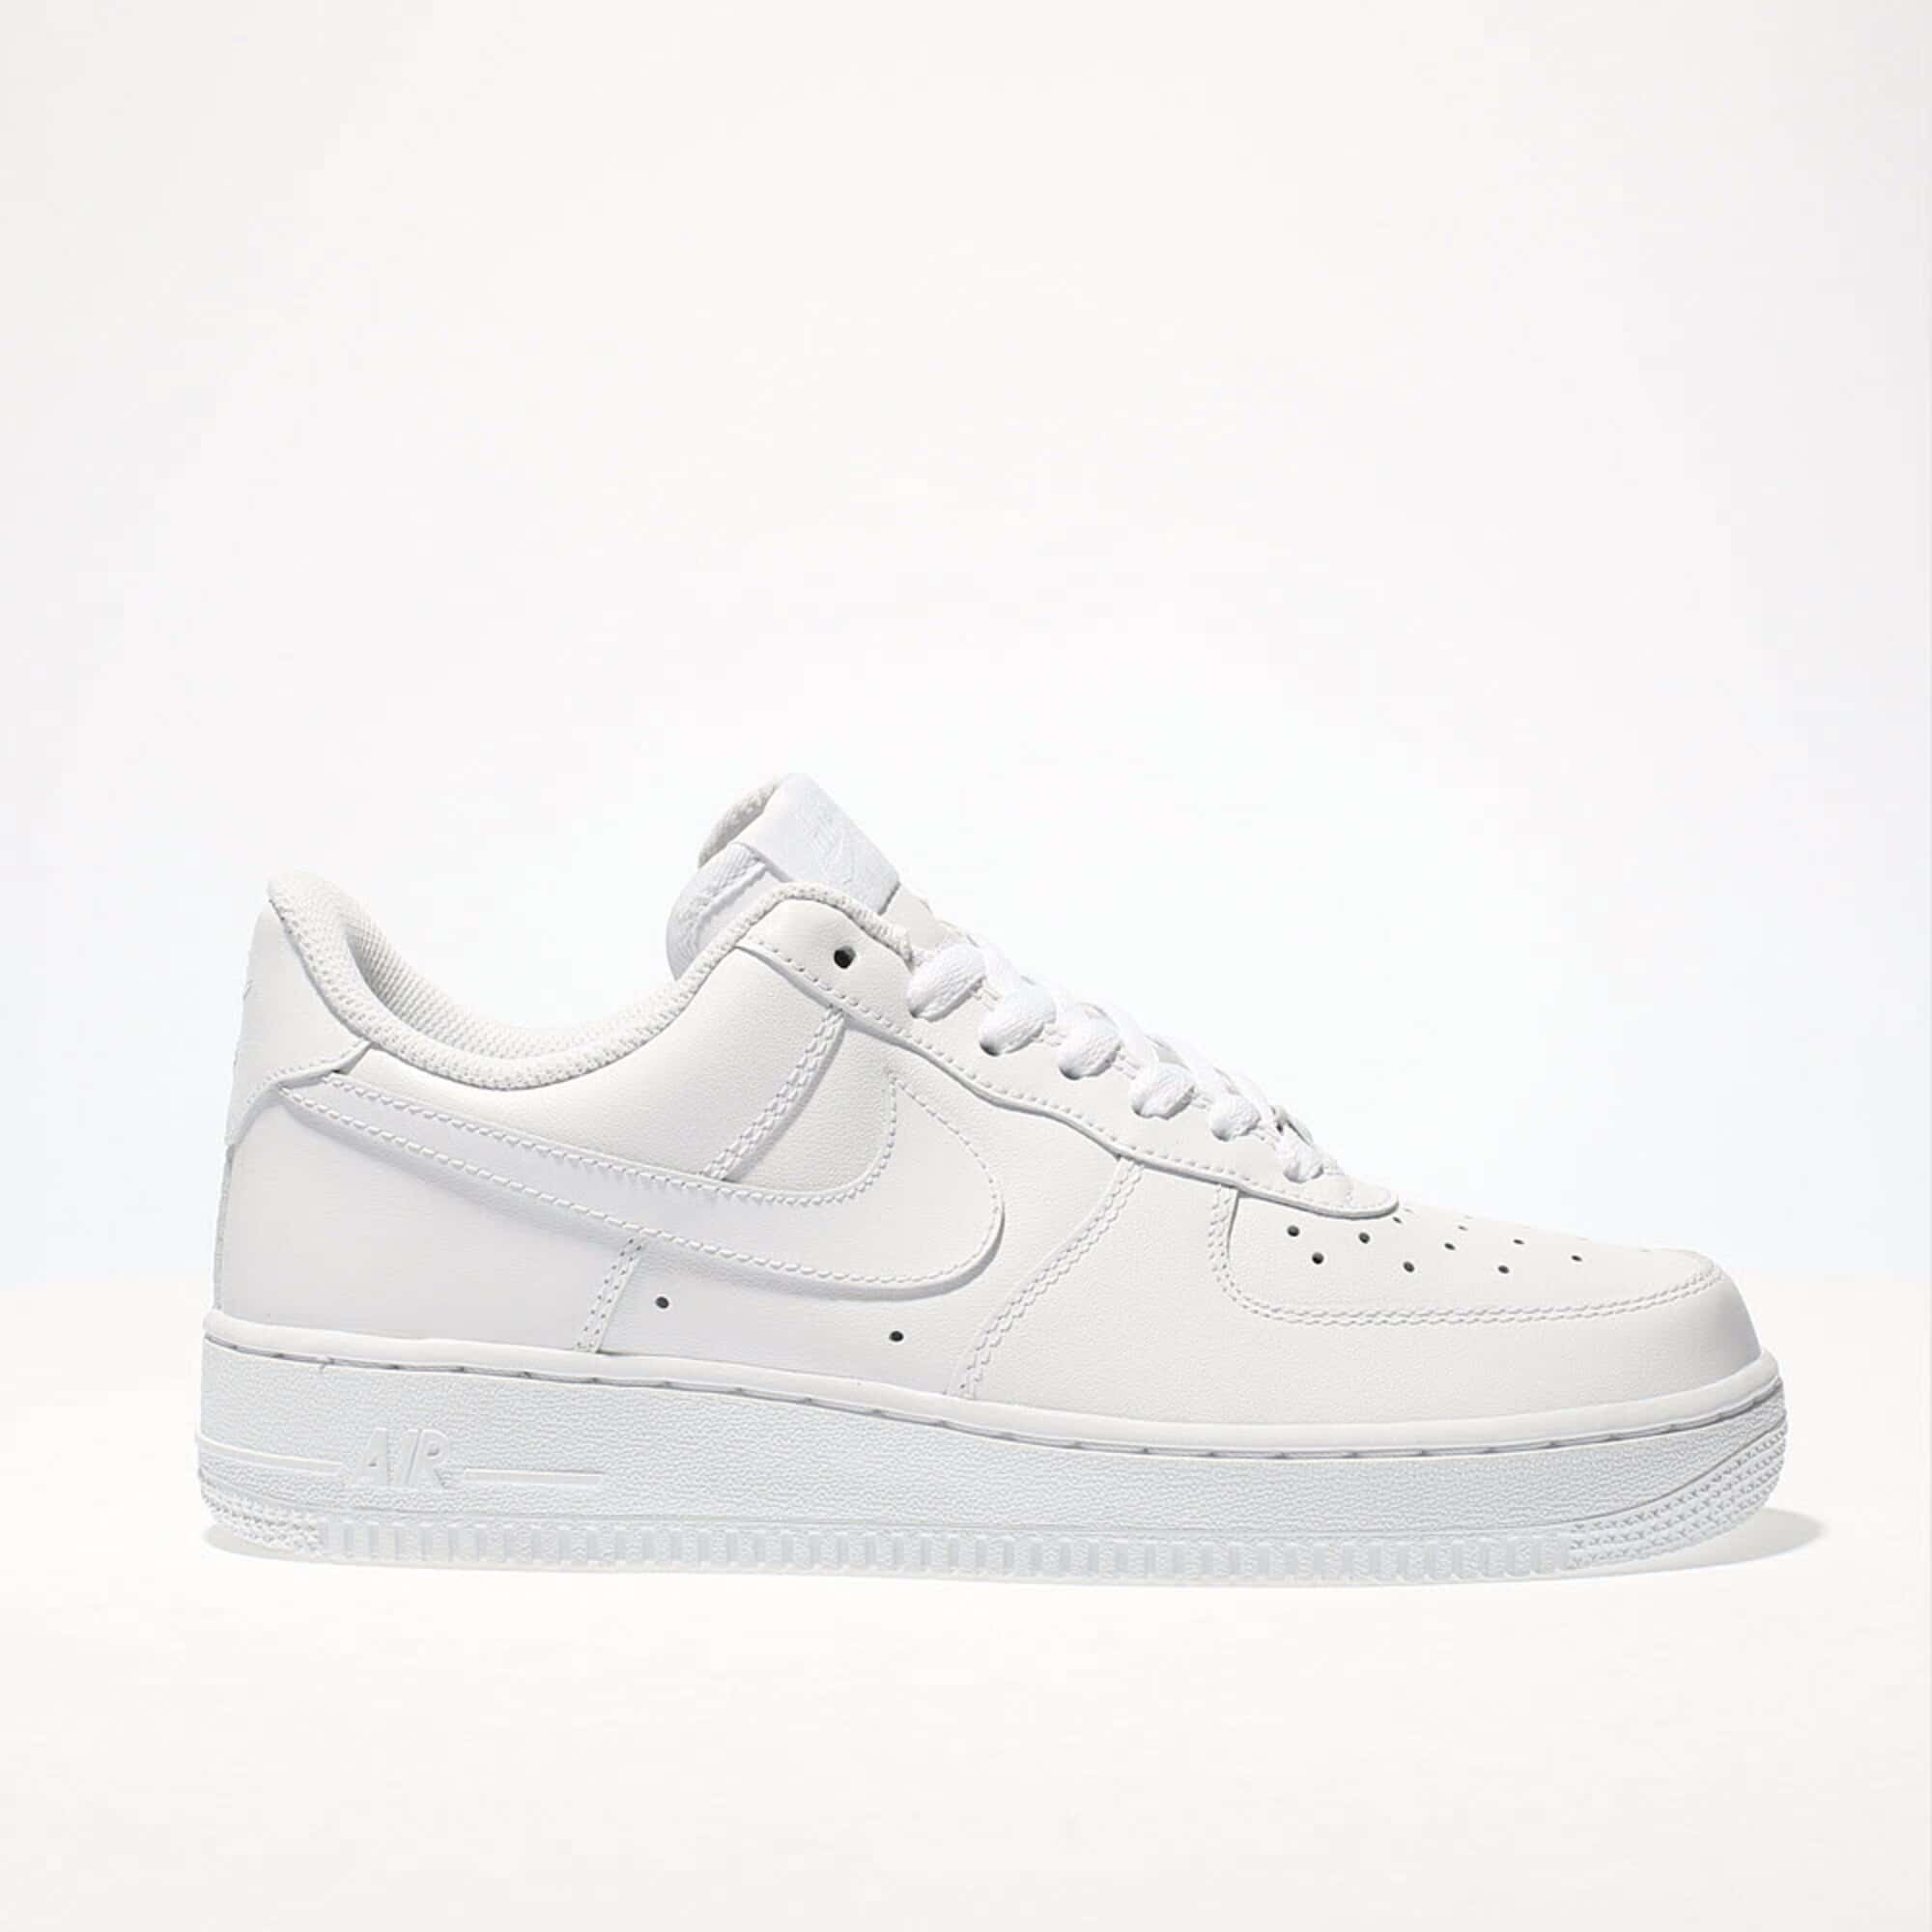 Womens White Nikes.jpg